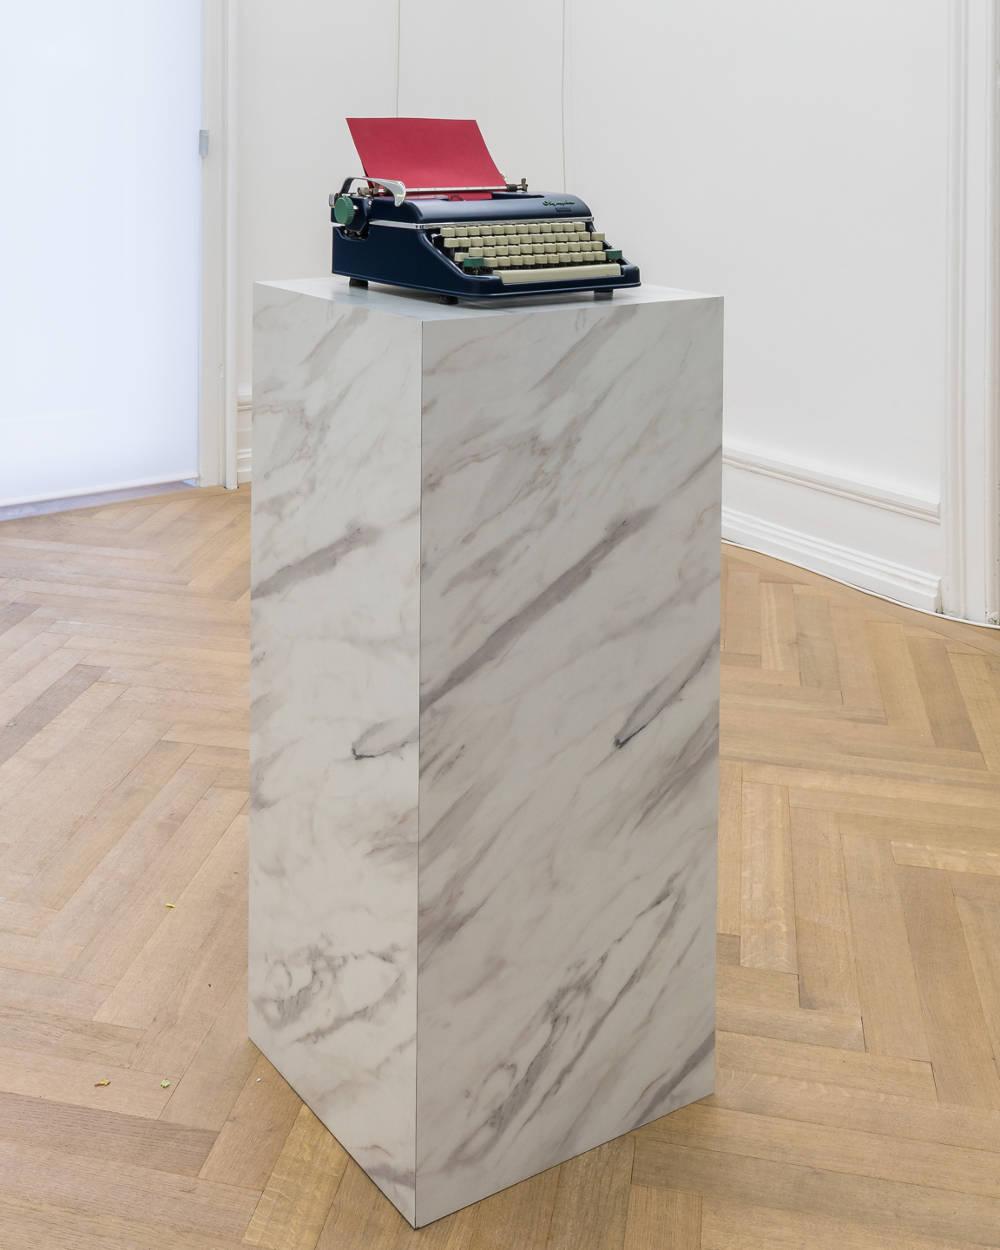 Jorge Méndez Blake, Pause II (Red), 2019. Typewriter, marble, edition of 1 + 1 AP, ed. 1/1, 2 parts, total 110 x 45 x 40 cm (43 1/4 x 17 3/4 x 15 3/4 in.)